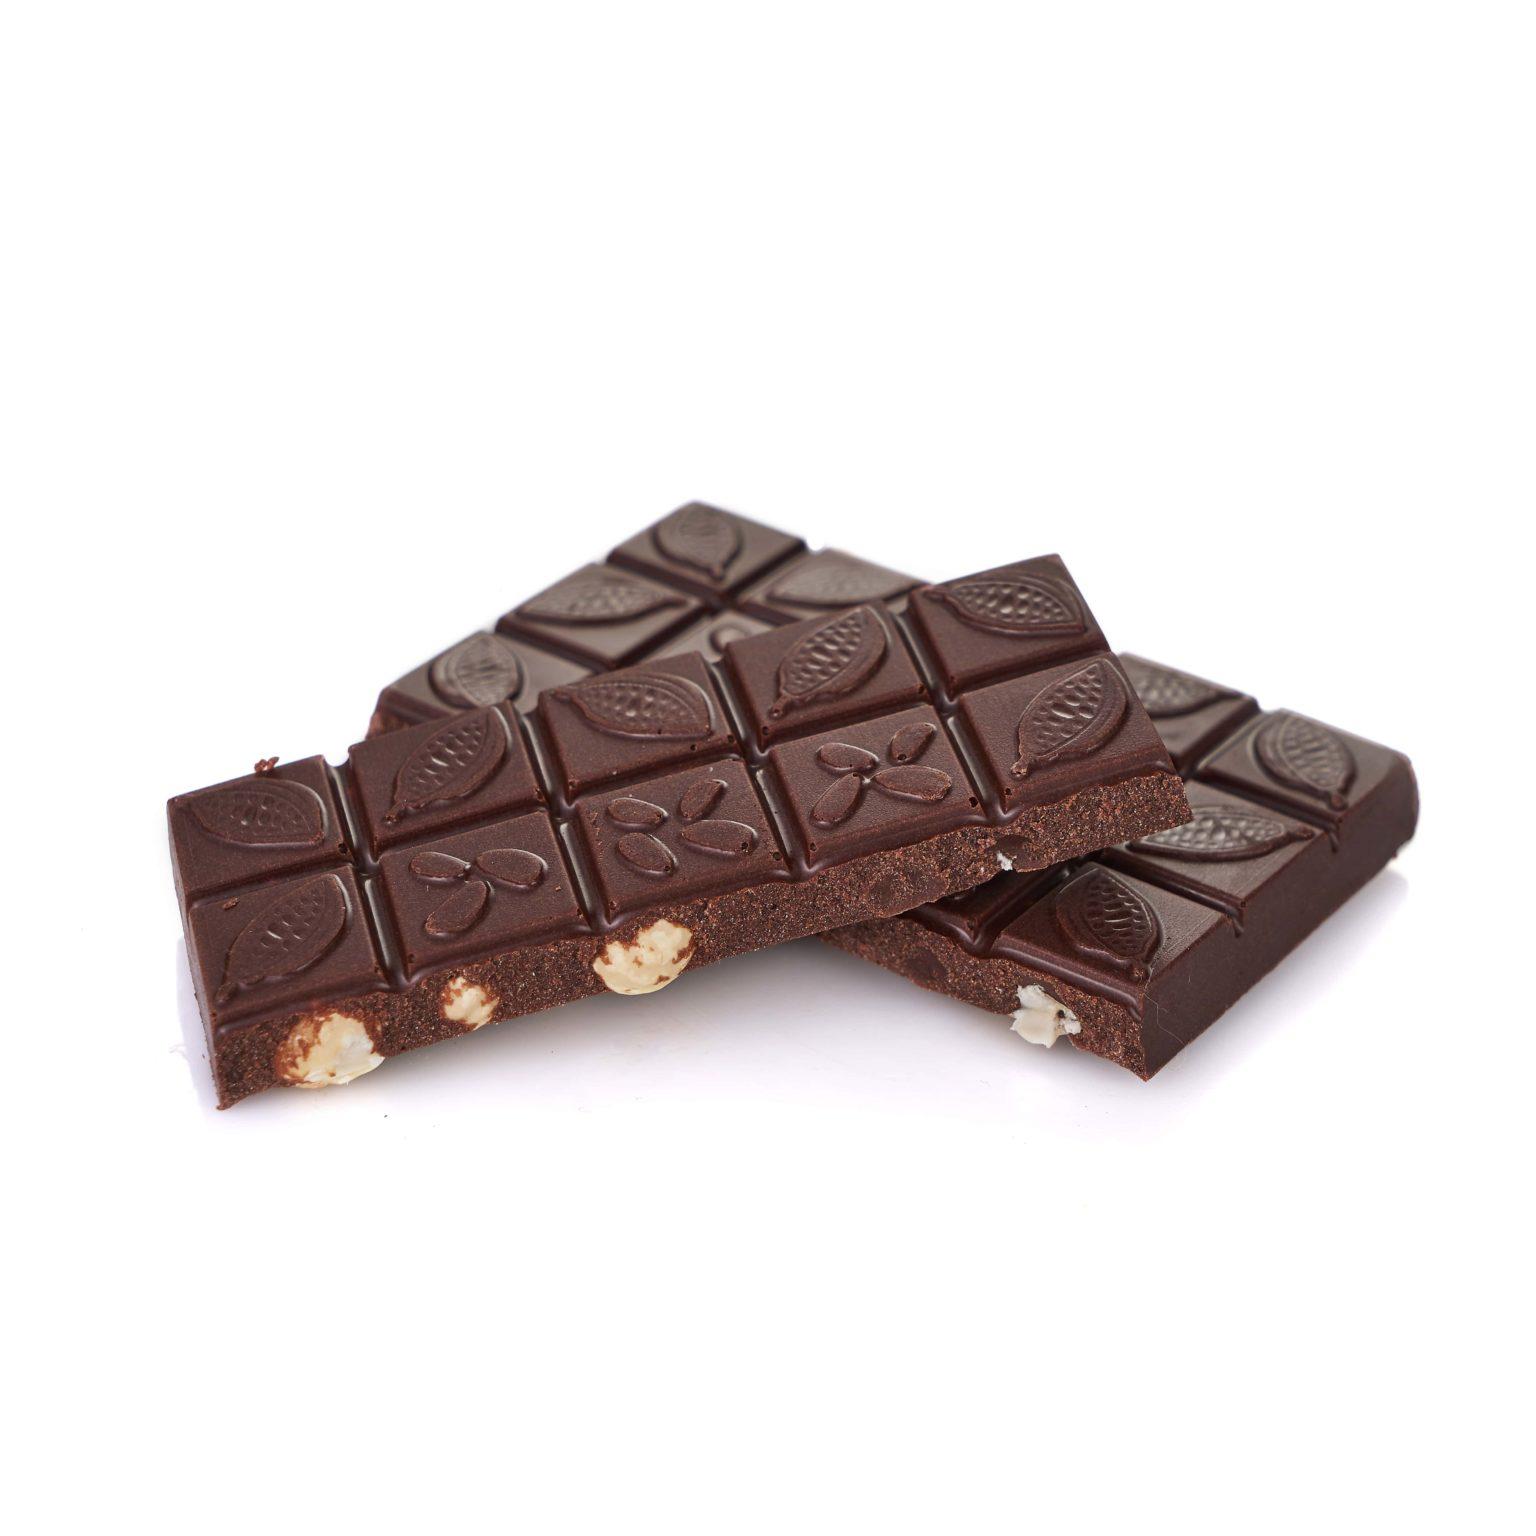 Молочный Шоколад на Меду — Фундук - фото 2